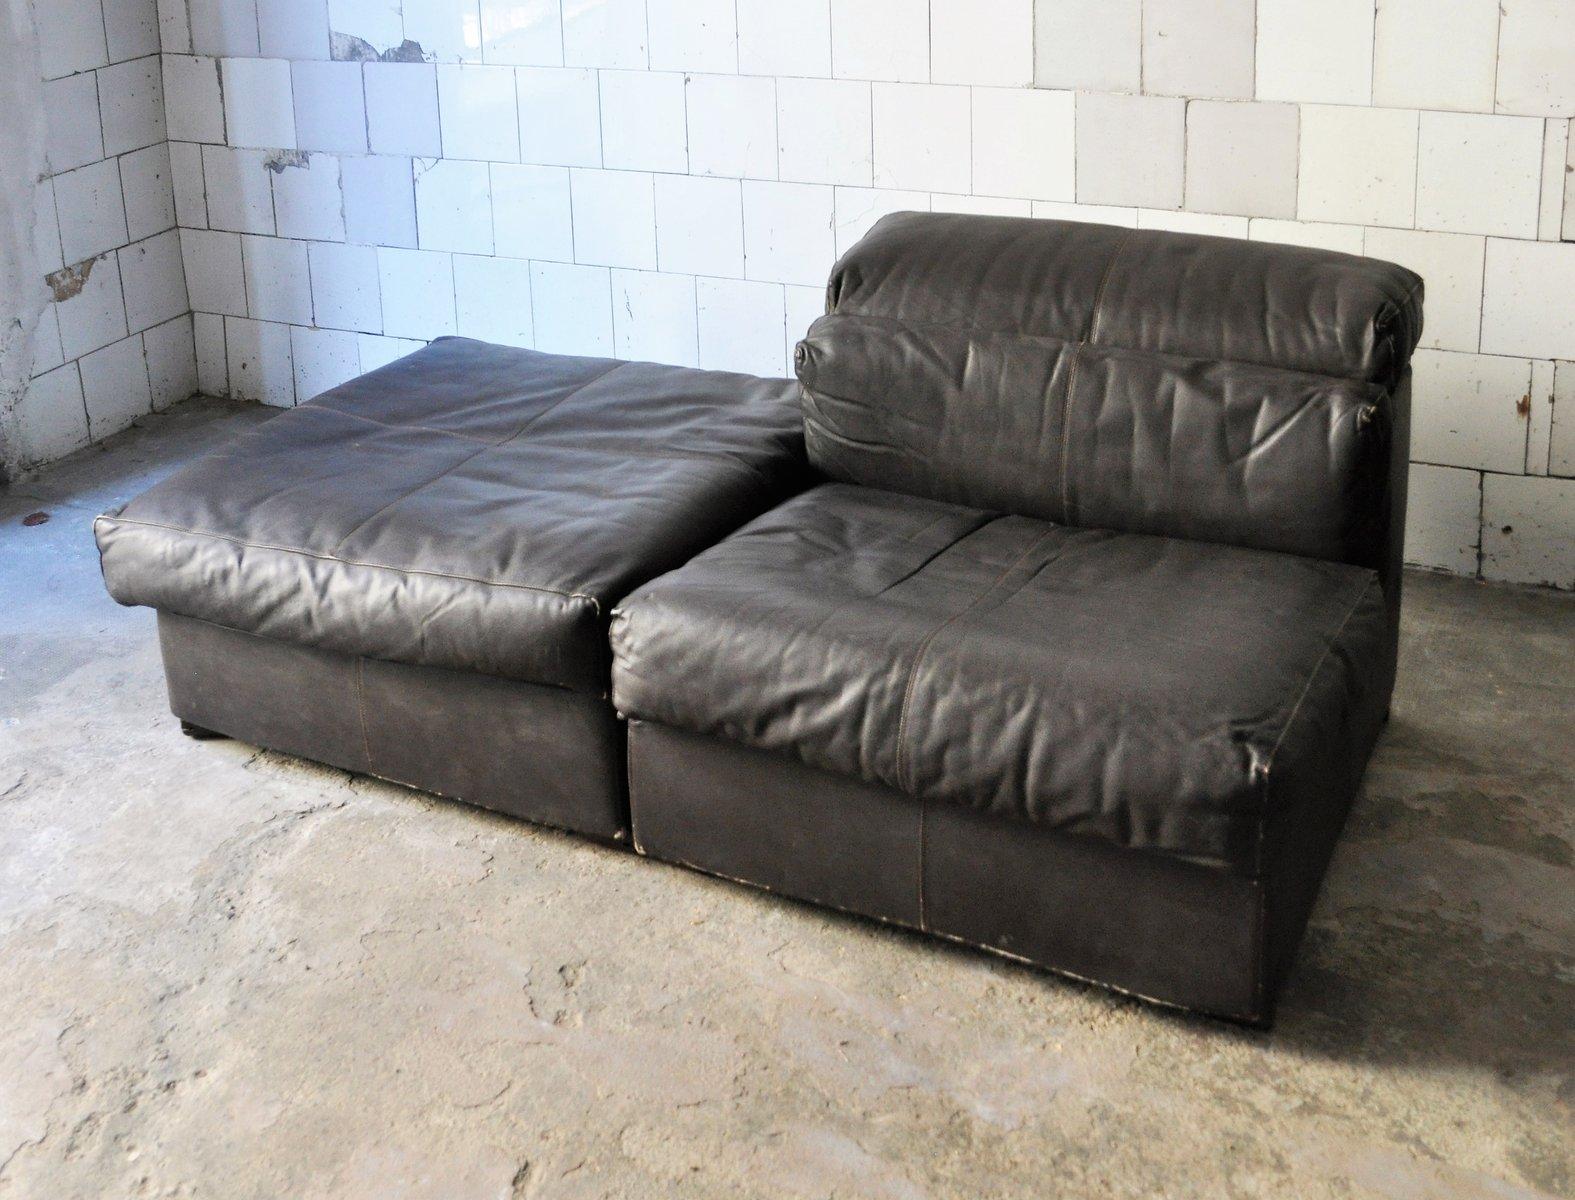 ledersofa von afra tobia scarpa f r b b italia 1974 bei pamono kaufen. Black Bedroom Furniture Sets. Home Design Ideas